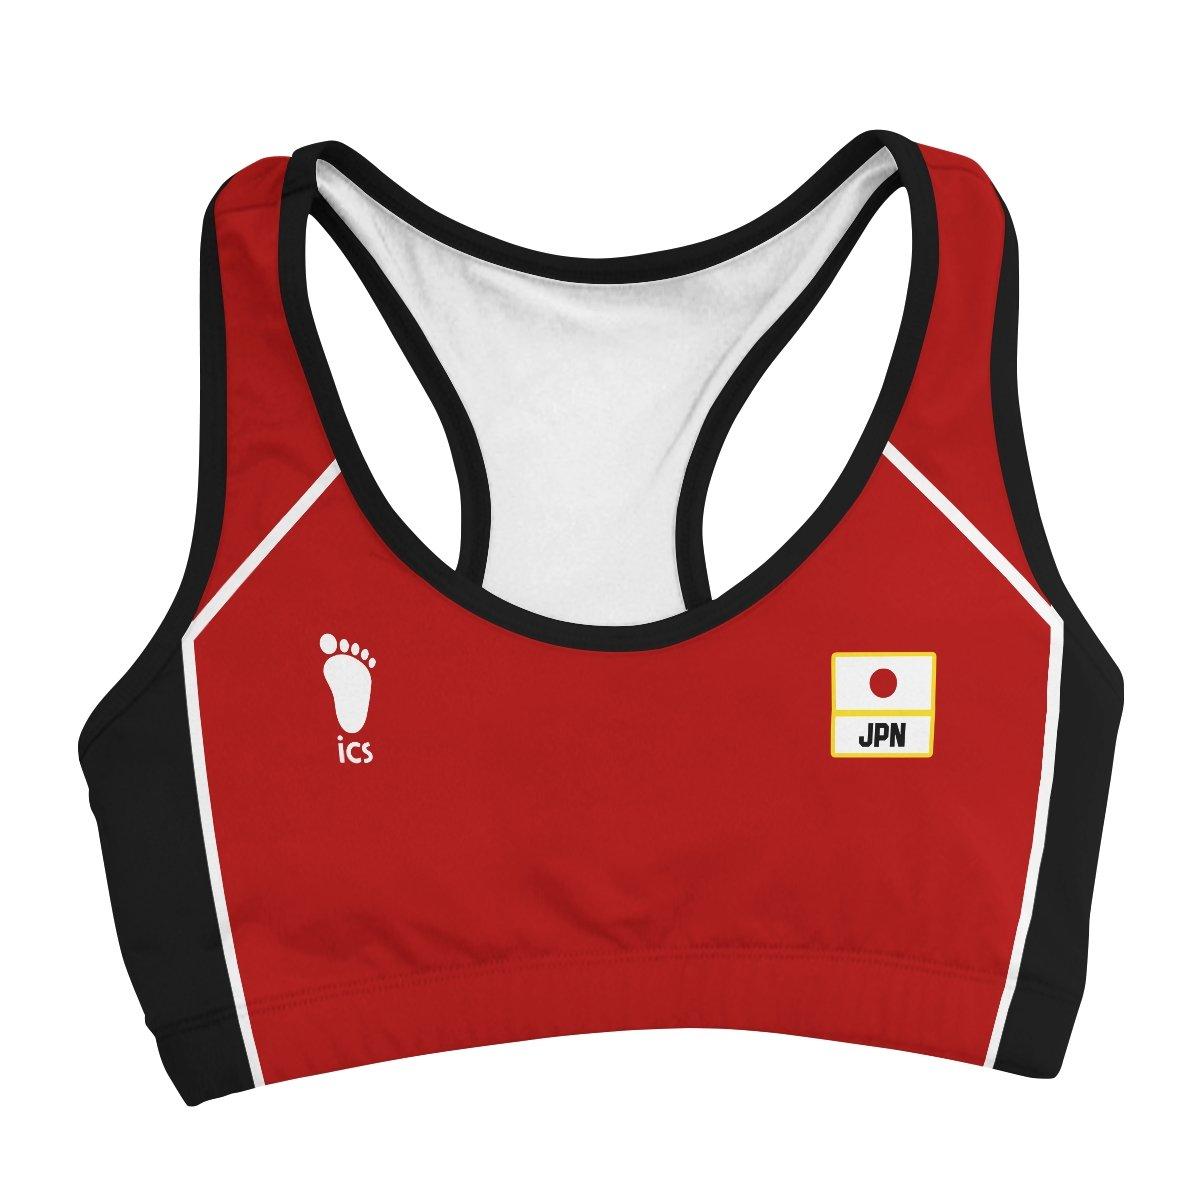 haikyuu national team active wear set 562757 - Anime Swimsuits